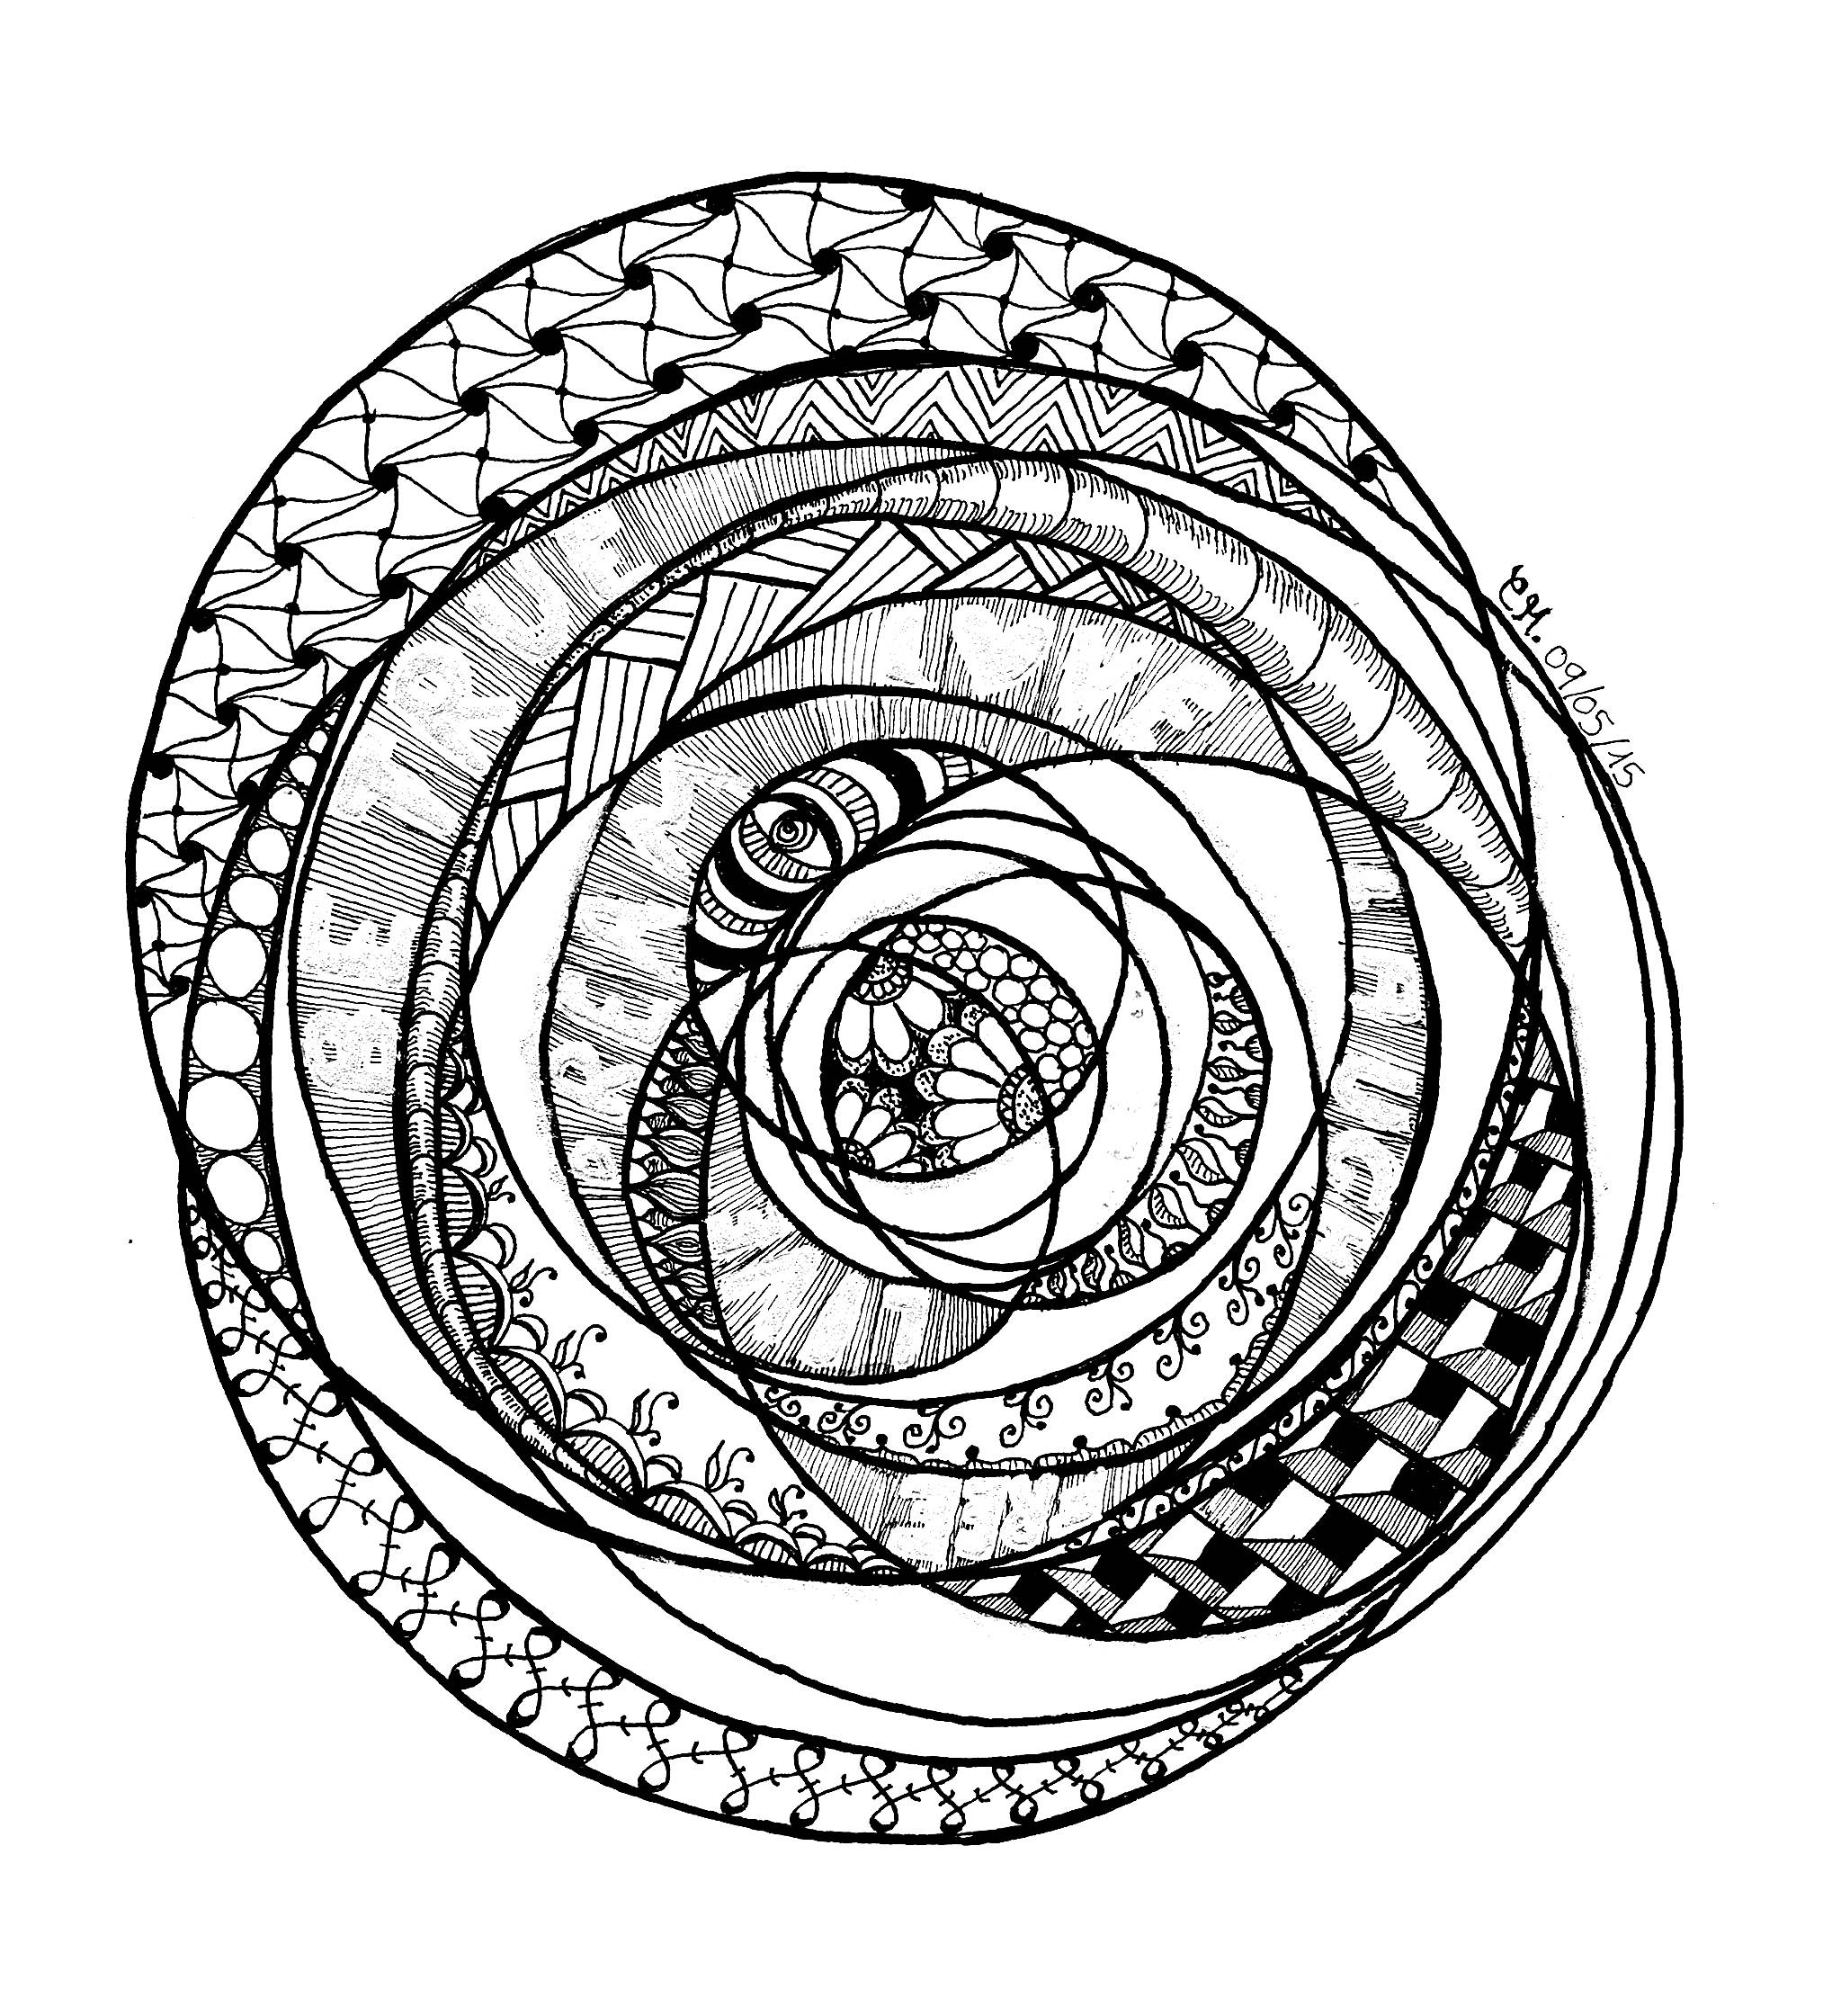 'Etre vrai', coloriage original style Zentangle  Voir l'oeuvre originale